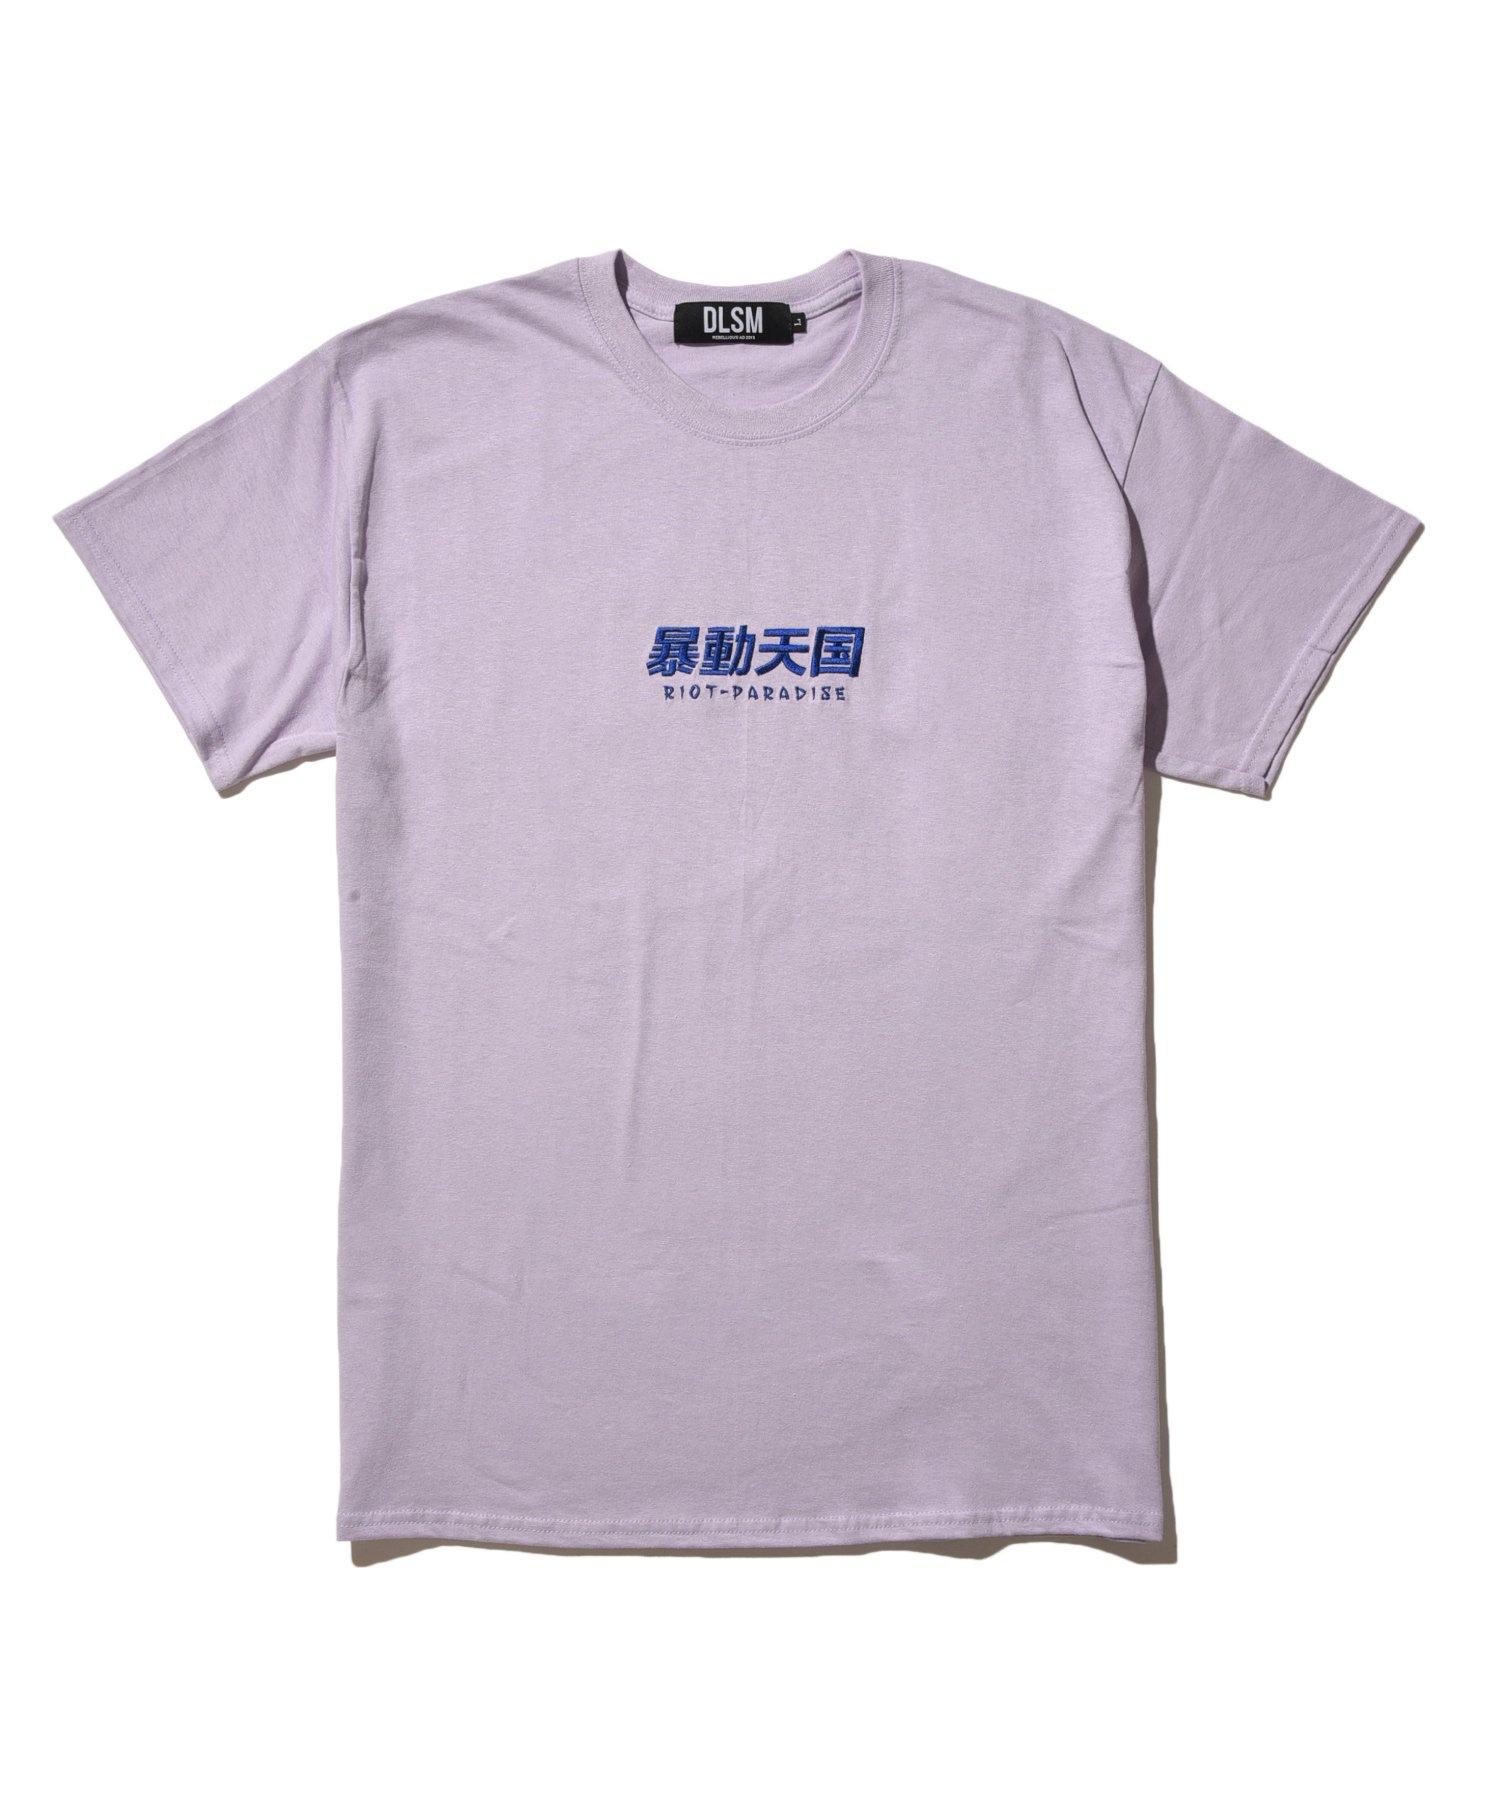 DLSM 暴動天国 TEE